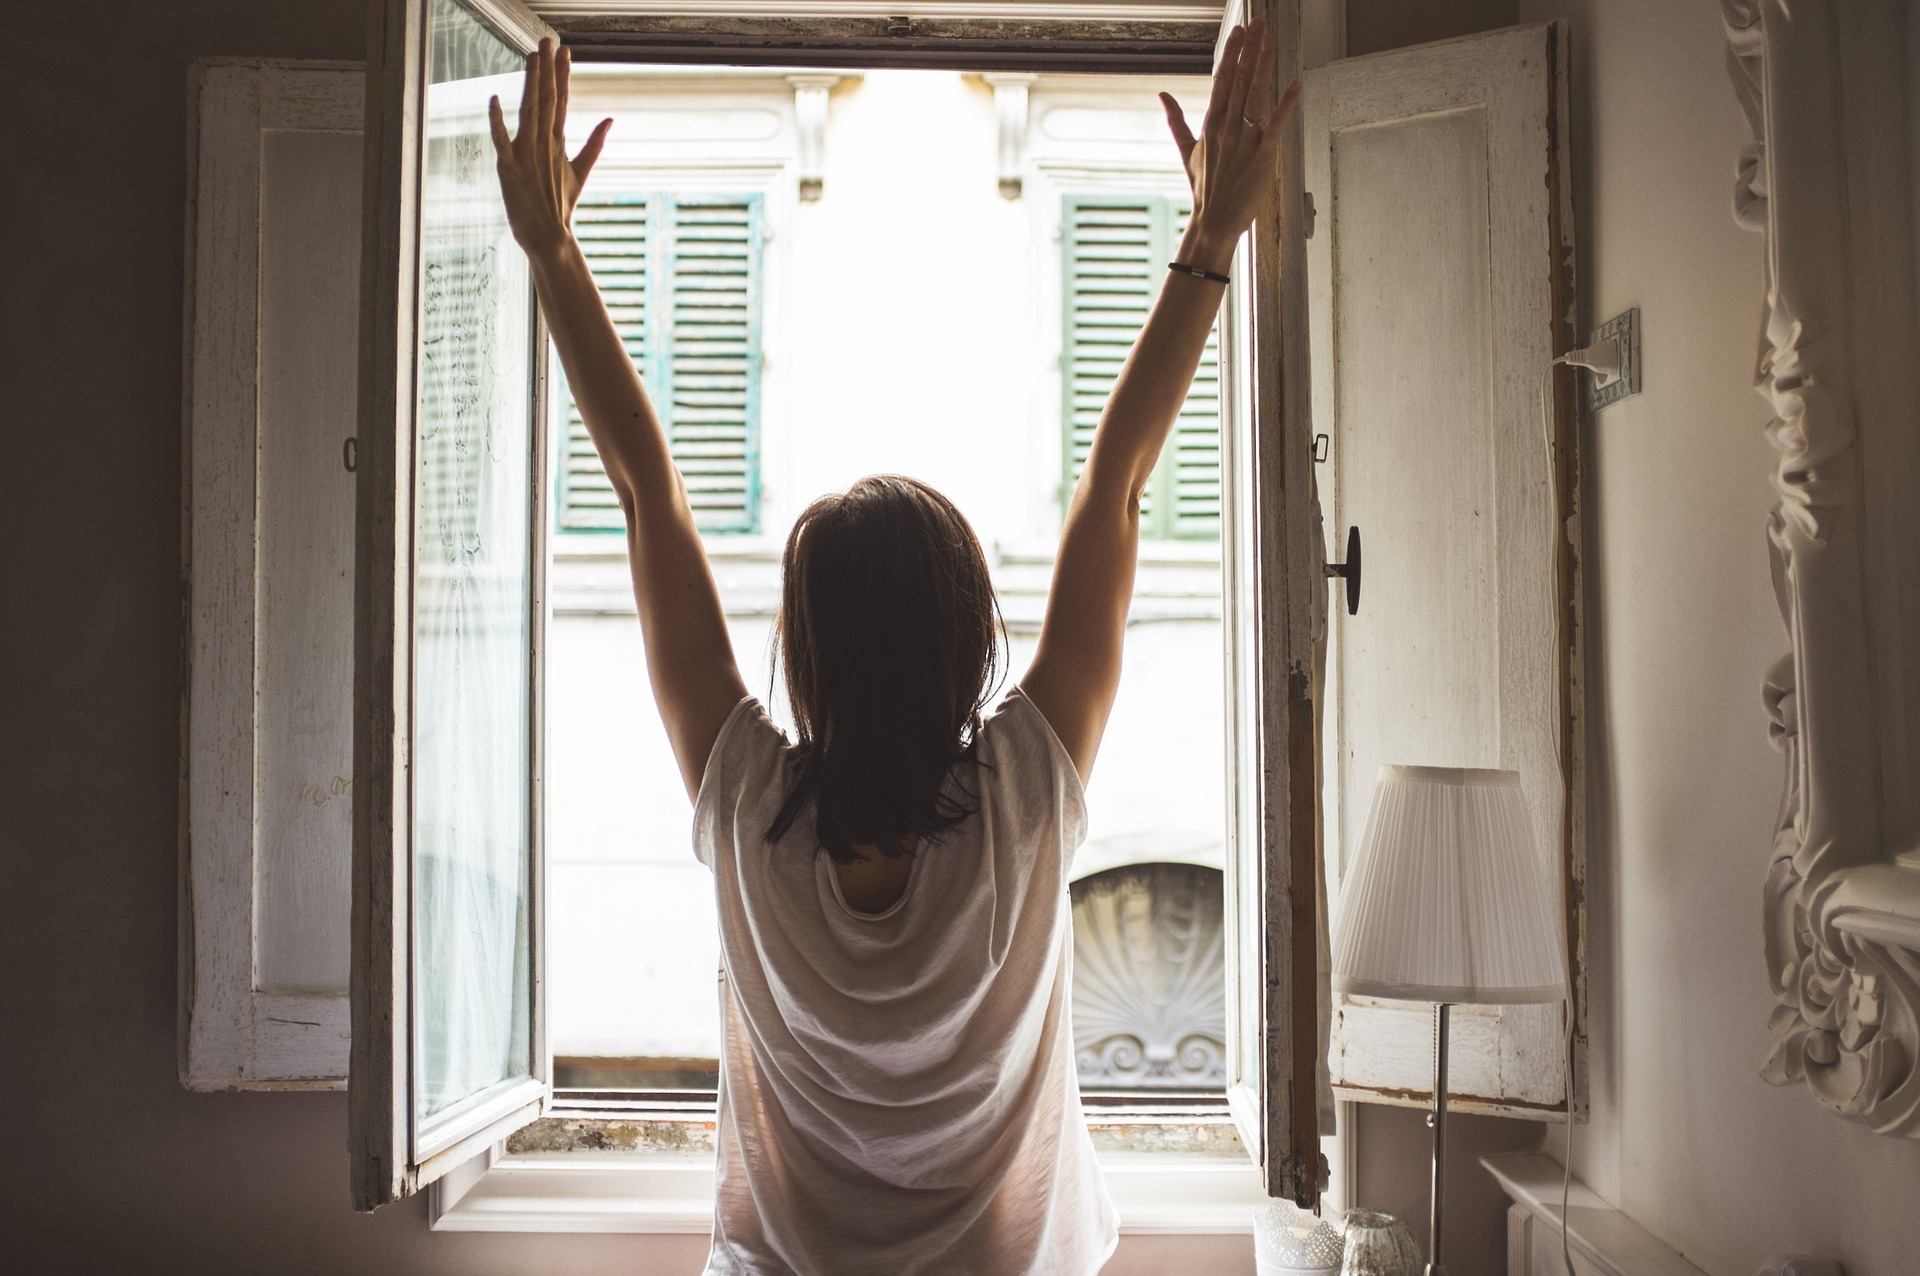 Frau, Fenster, Motivation